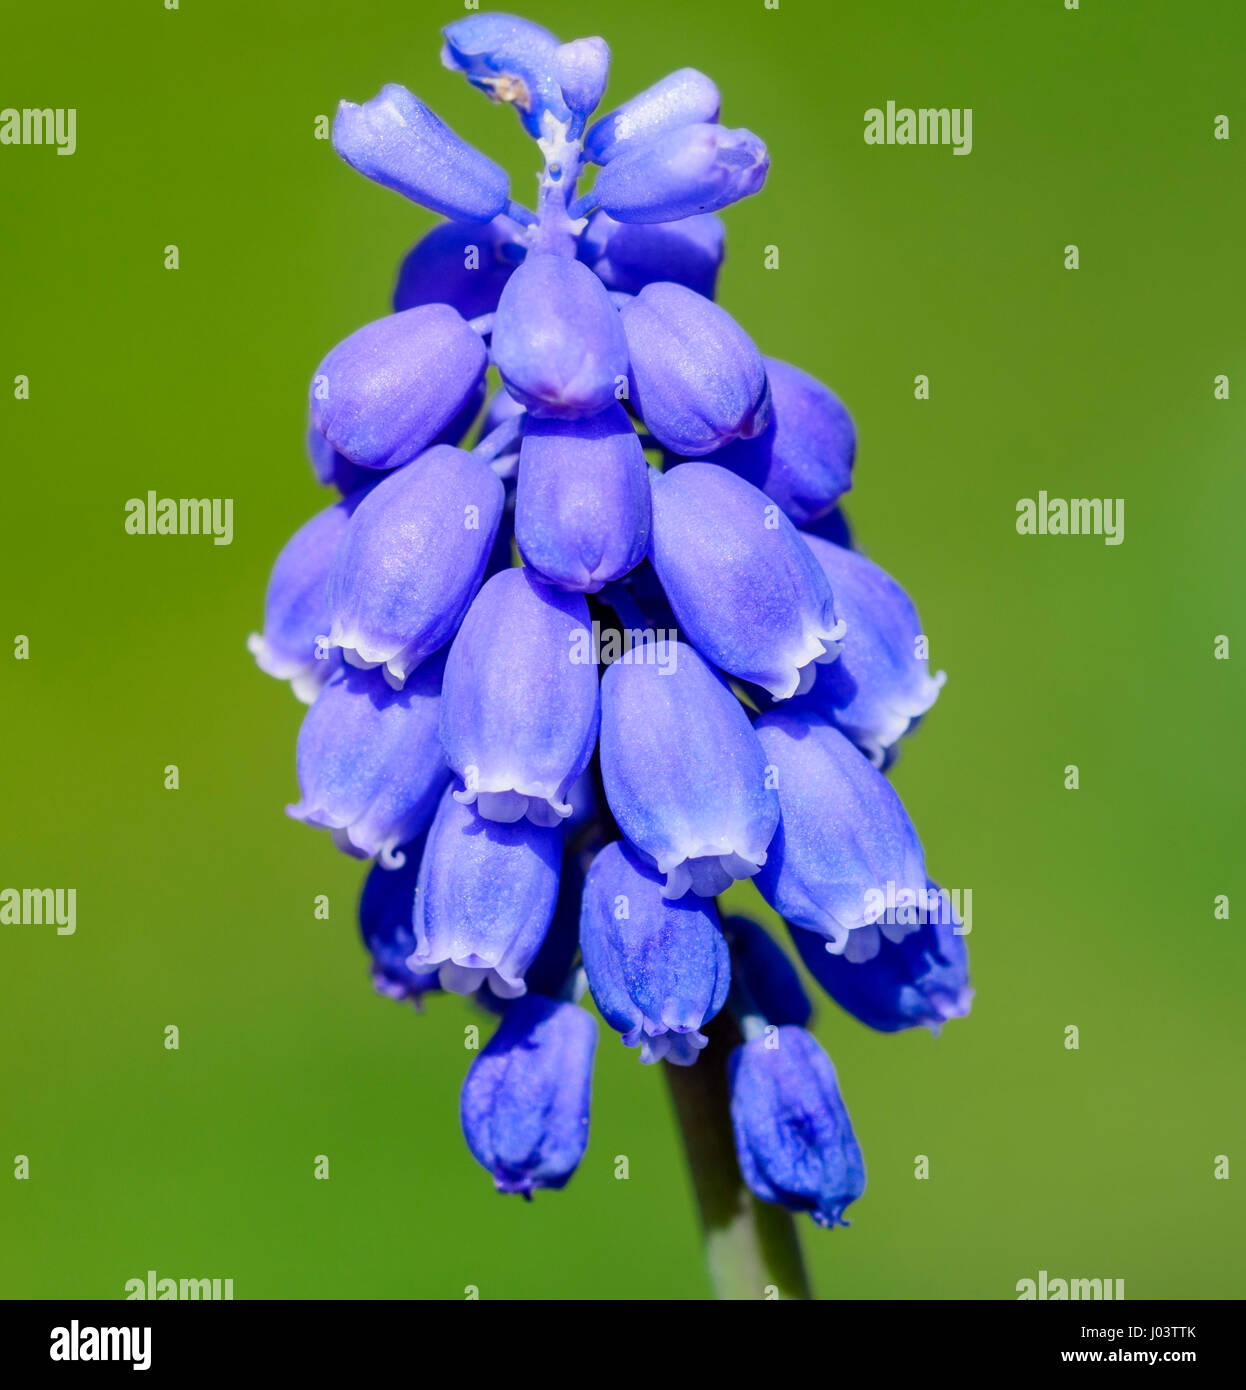 Grape Hyacinth. Close up of an Armenian Grape Hyacinth (Muscari armeniacum) plant in West Sussex, England, UK. Grape - Stock Image